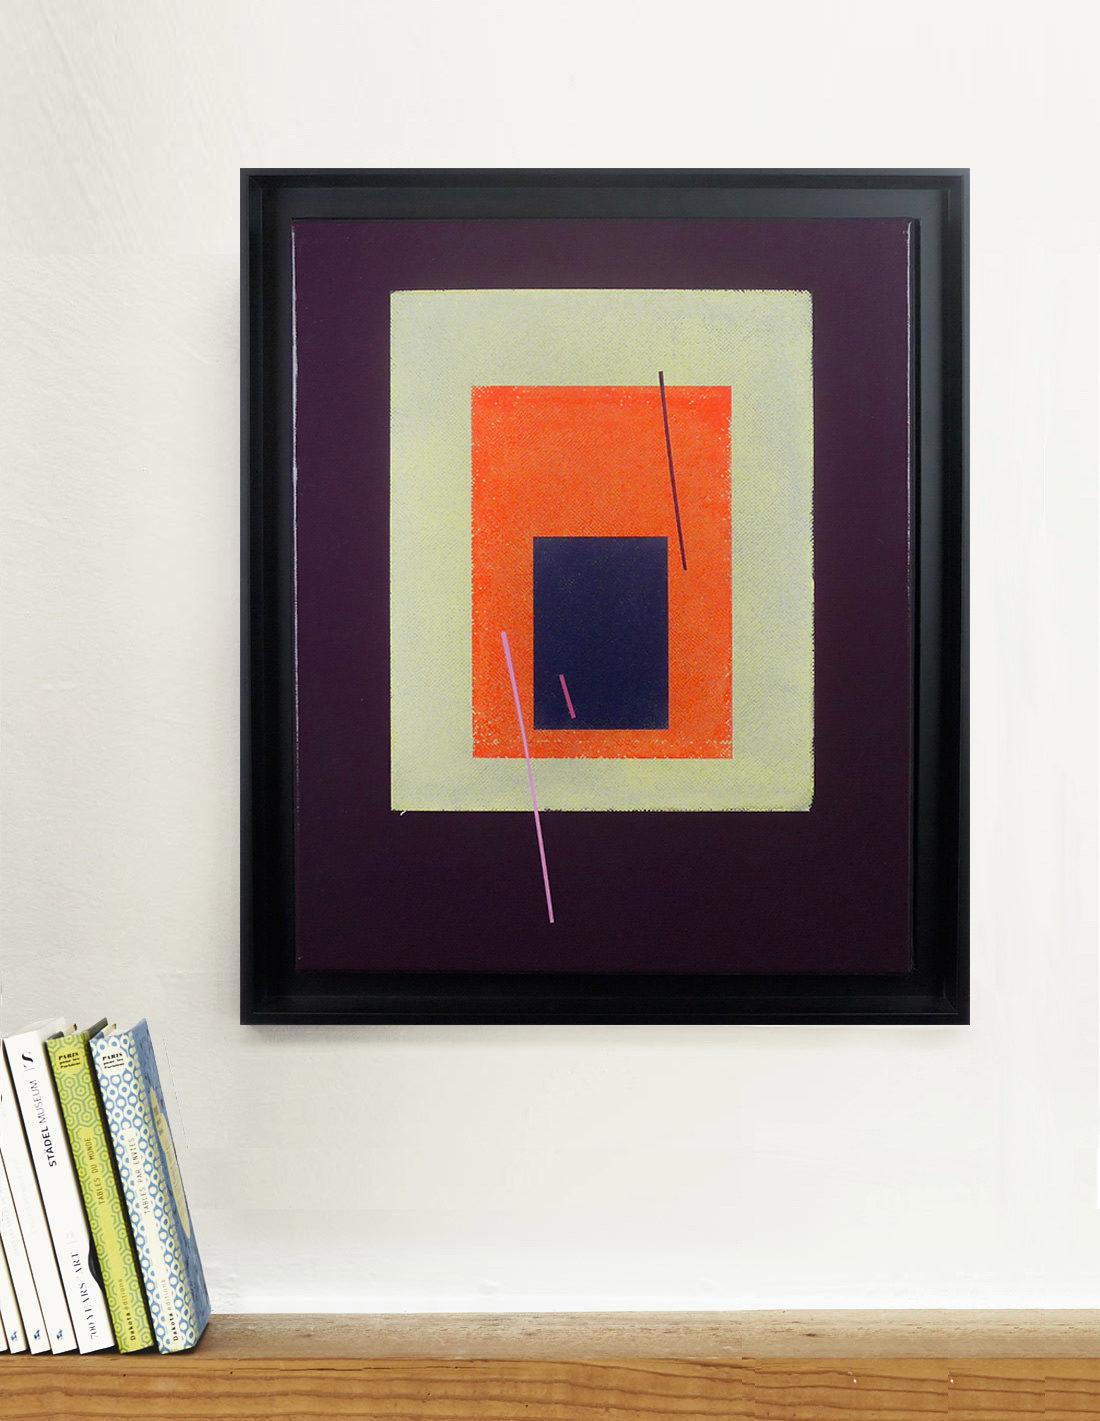 Carlos Stoffel - Tableau - Violet carré orange